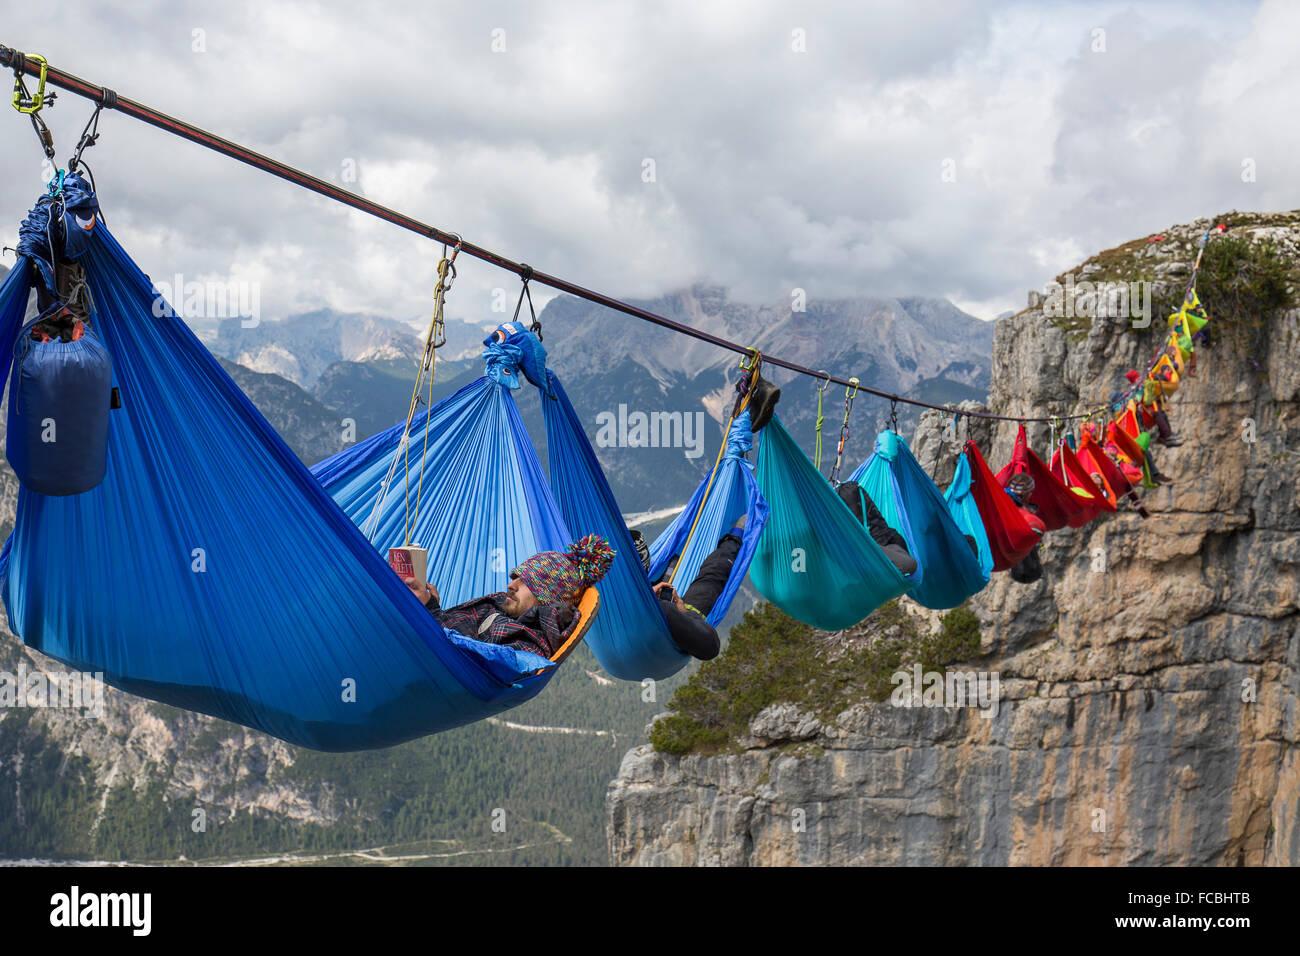 Monte Piana Hammock Session - Stock Image